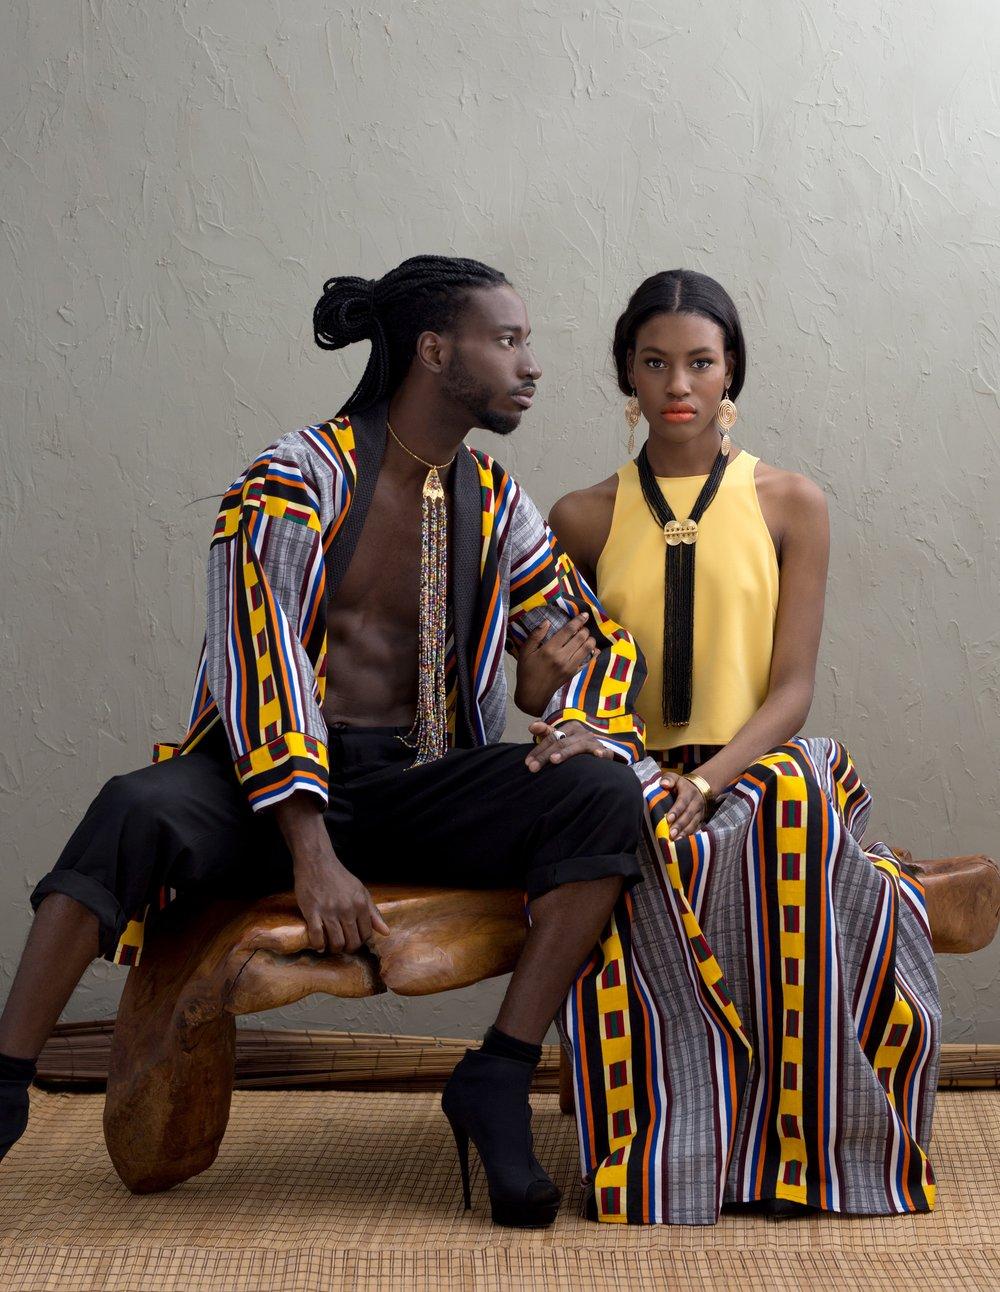 JulieStGeorgesPhotographe-ShootAfricain01